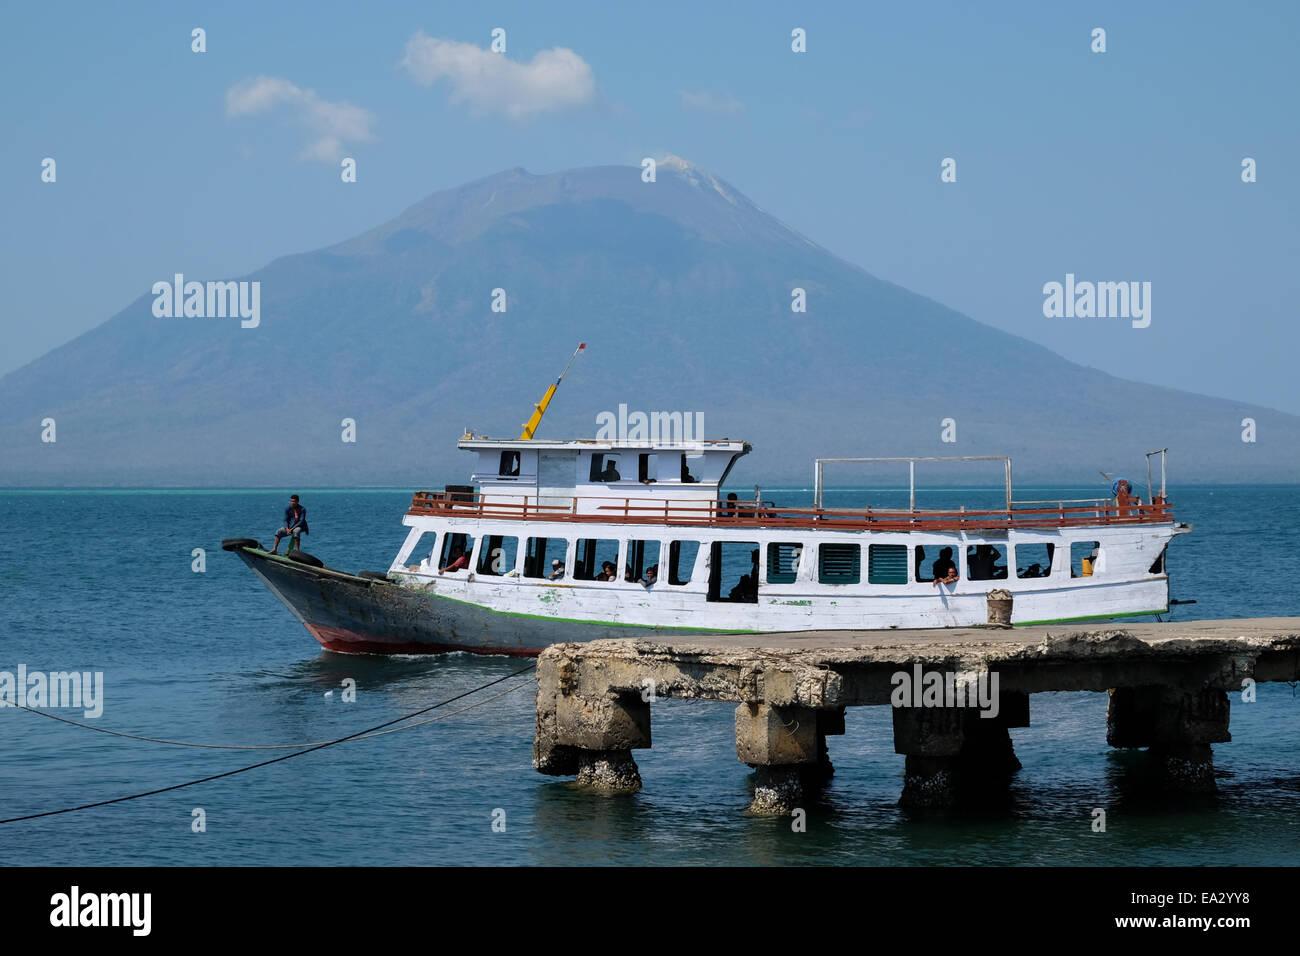 A public transportation boat approaching Lewoleba port, Lembata, East Nusa Tenggara, Indonesia. Mt Lewotolok at - Stock Image